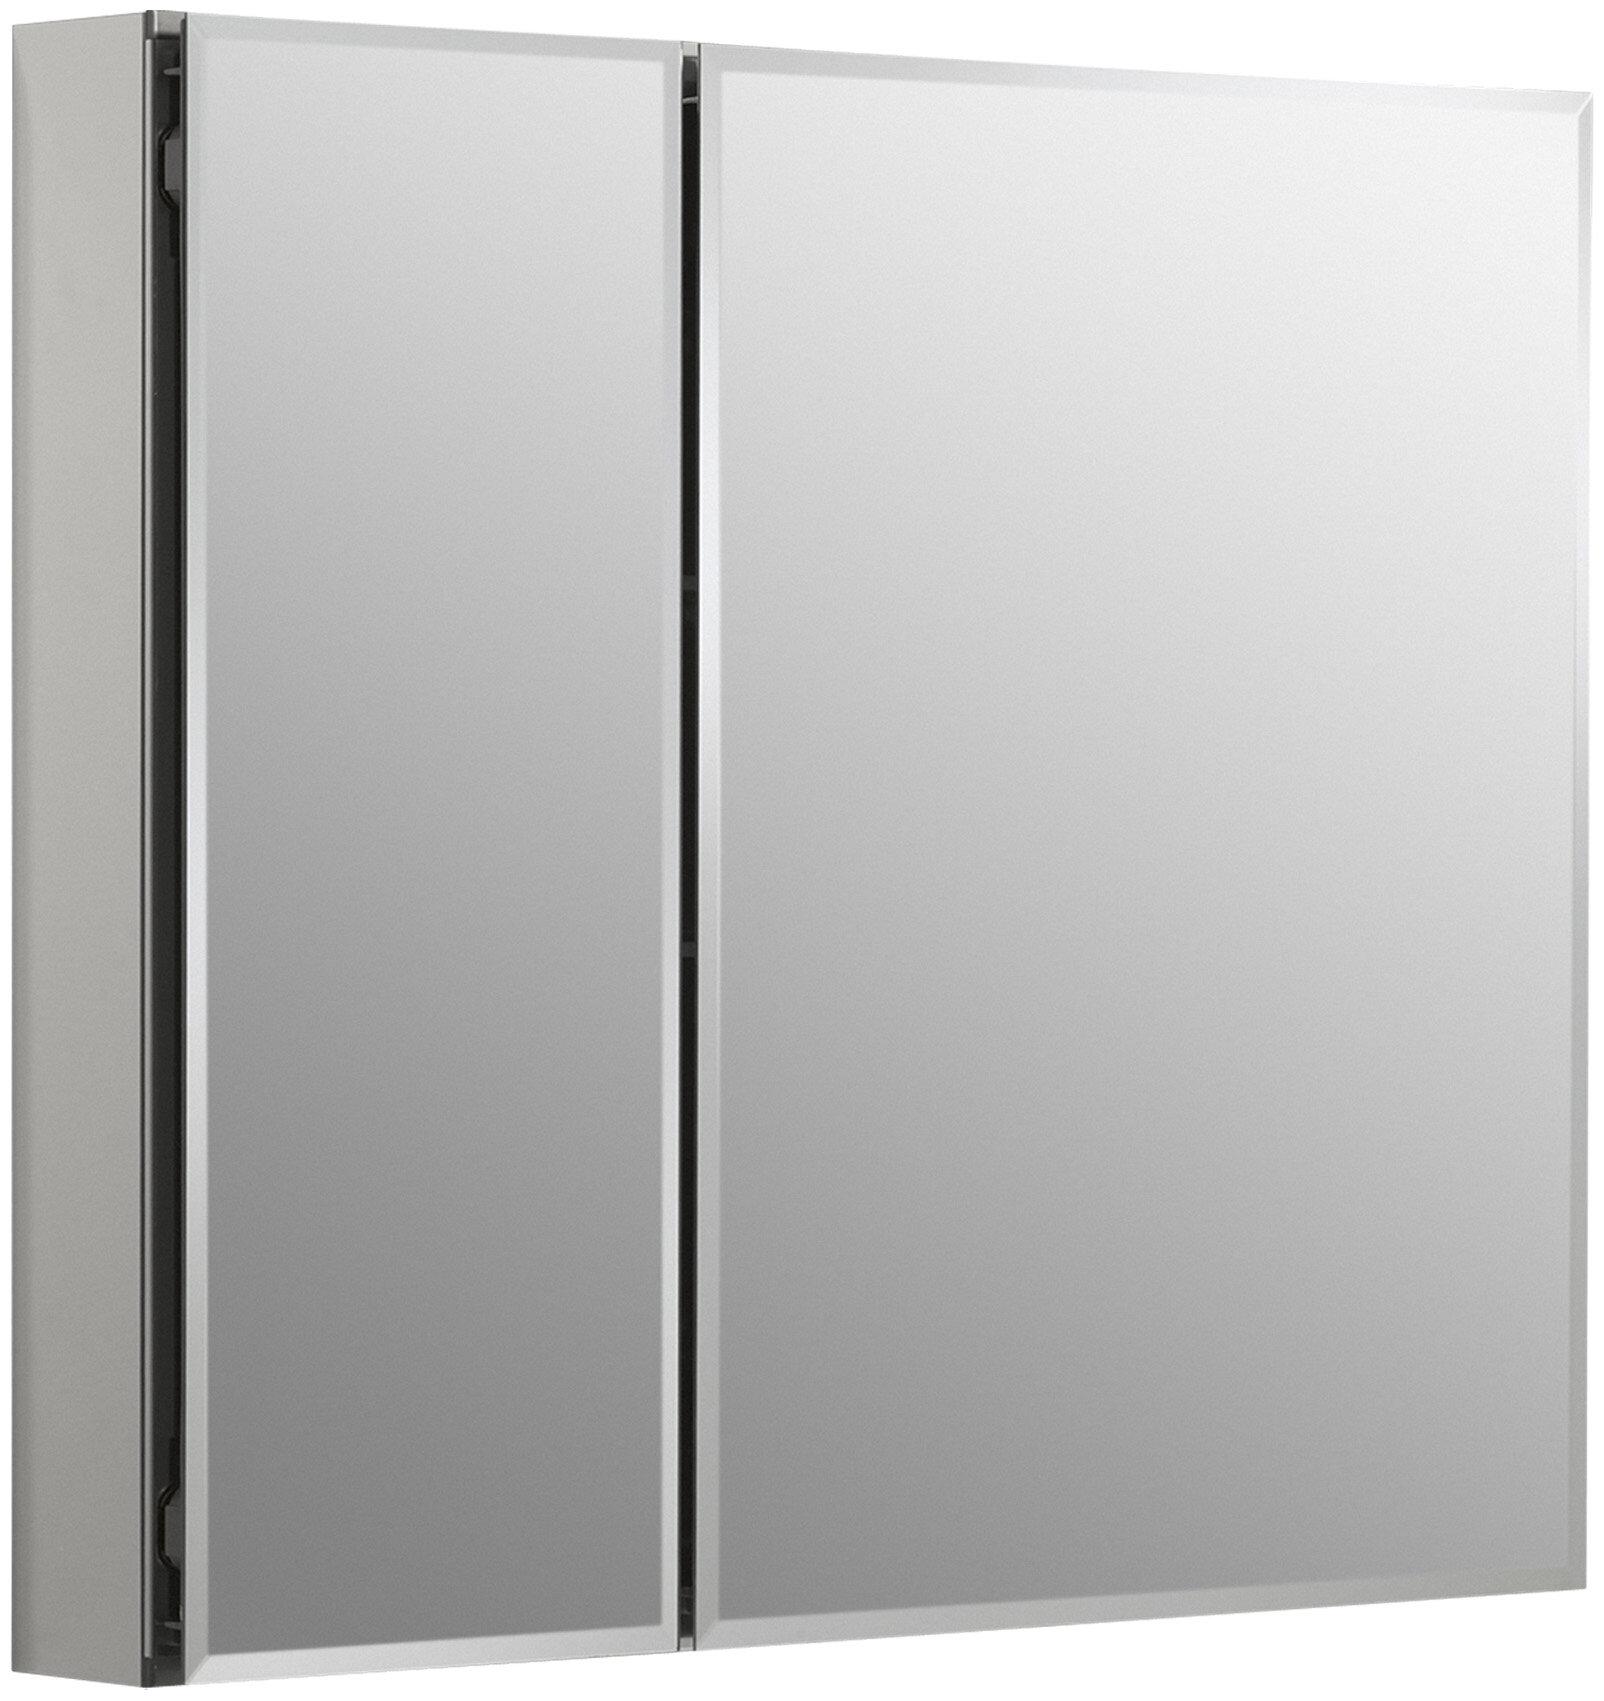 30  x 26  Aluminum Two-Door Medicine Cabinet with Mirrored Doors Beveled Edges u0026 Reviews | AllModern & 30